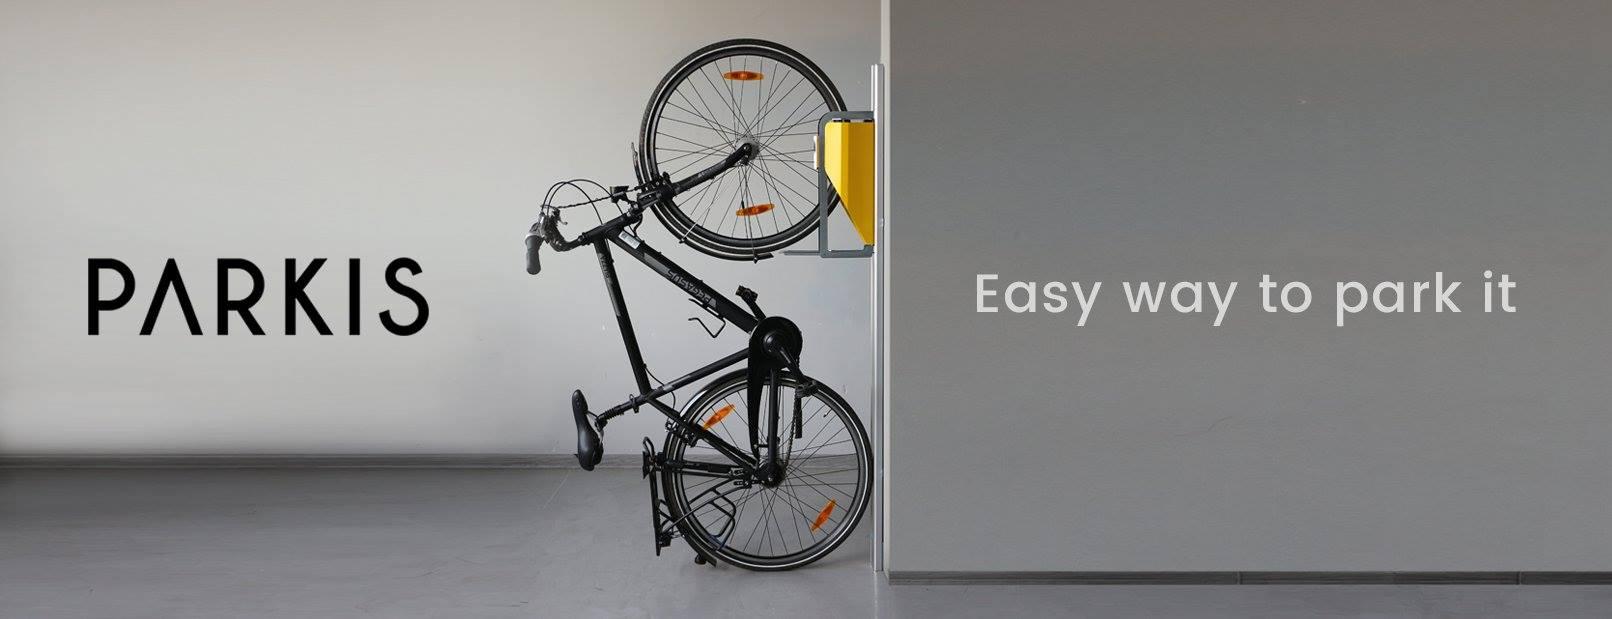 PARKIS aparcar bicicleta en vertical